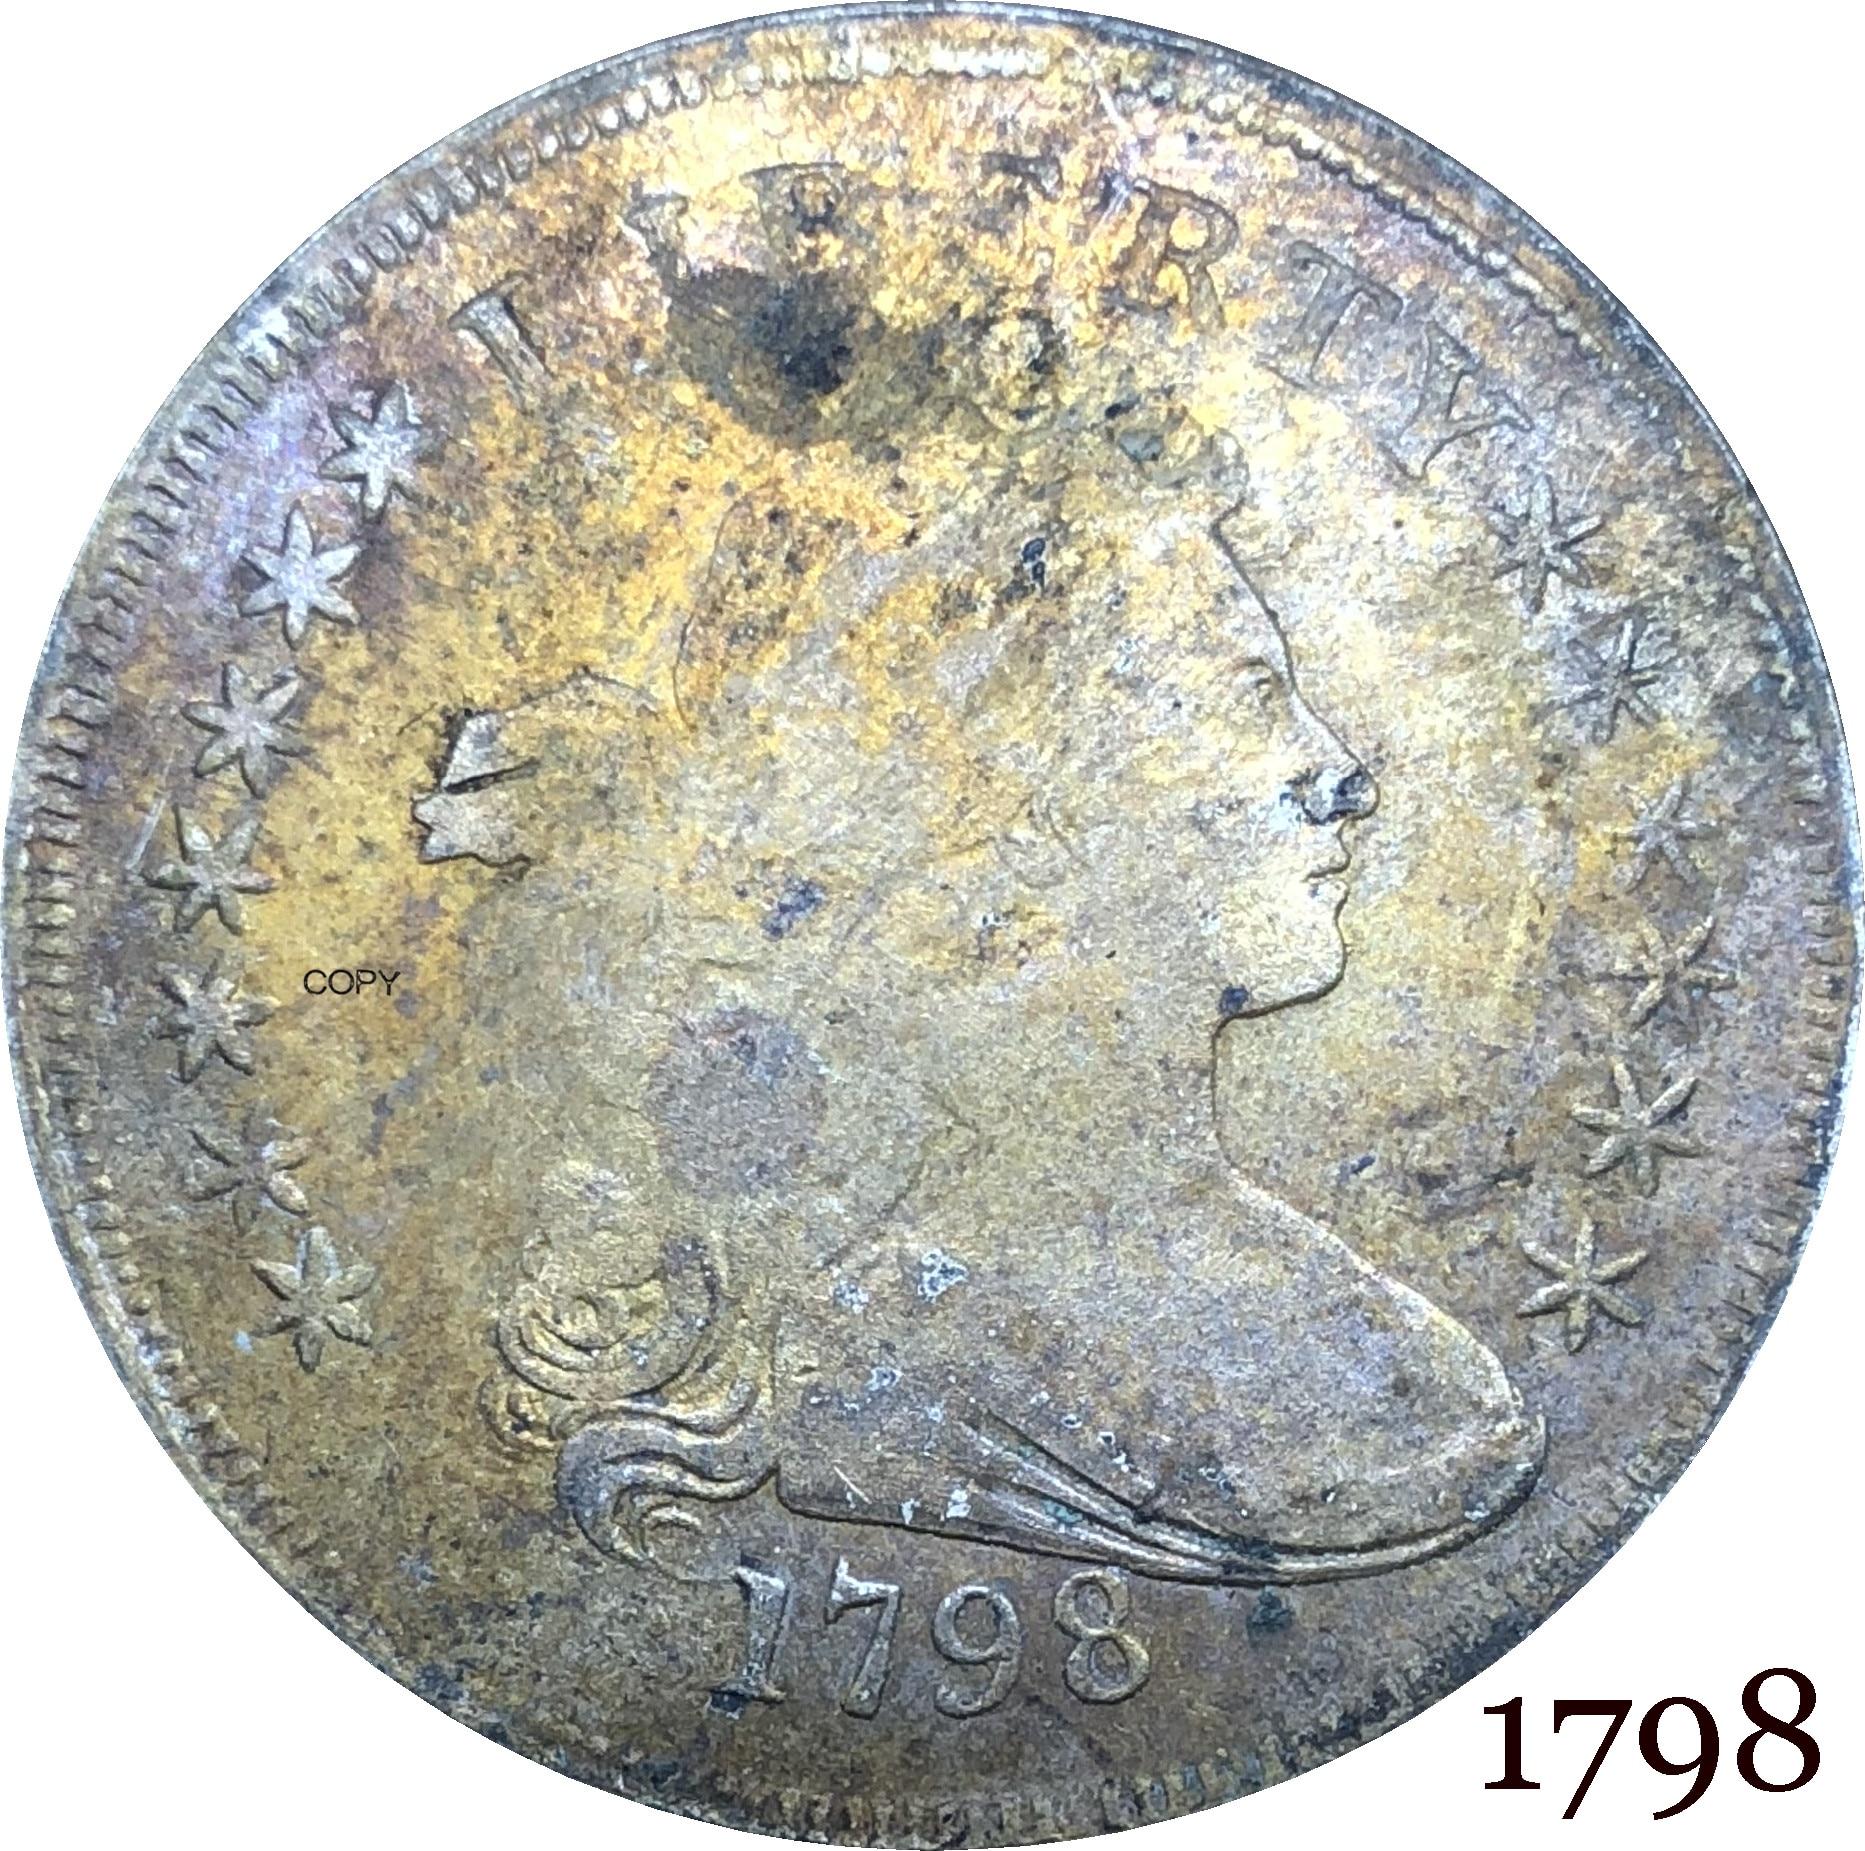 Estados unidos da américa moeda 1798 liberty broca busto um dólar, heraldic águia cupronickel prateado moedas de cópia